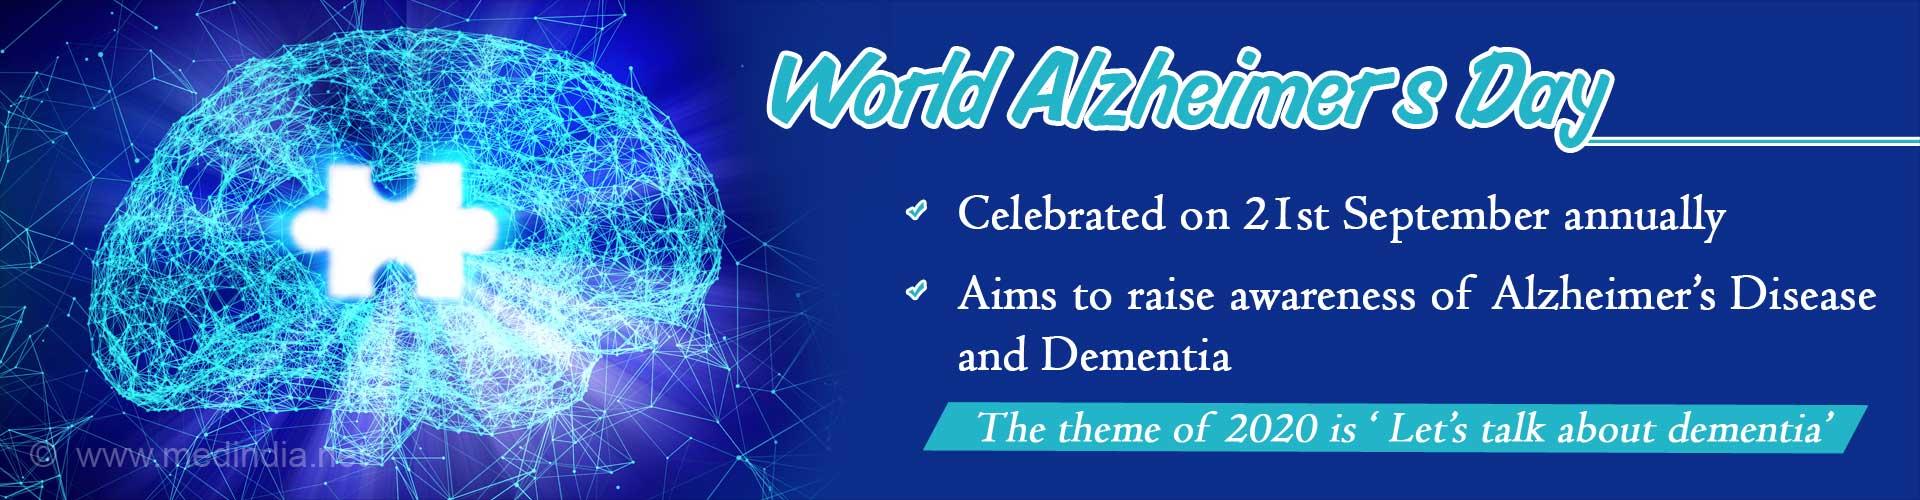 World Alzheimer's Day - Let's Talk About Dementia